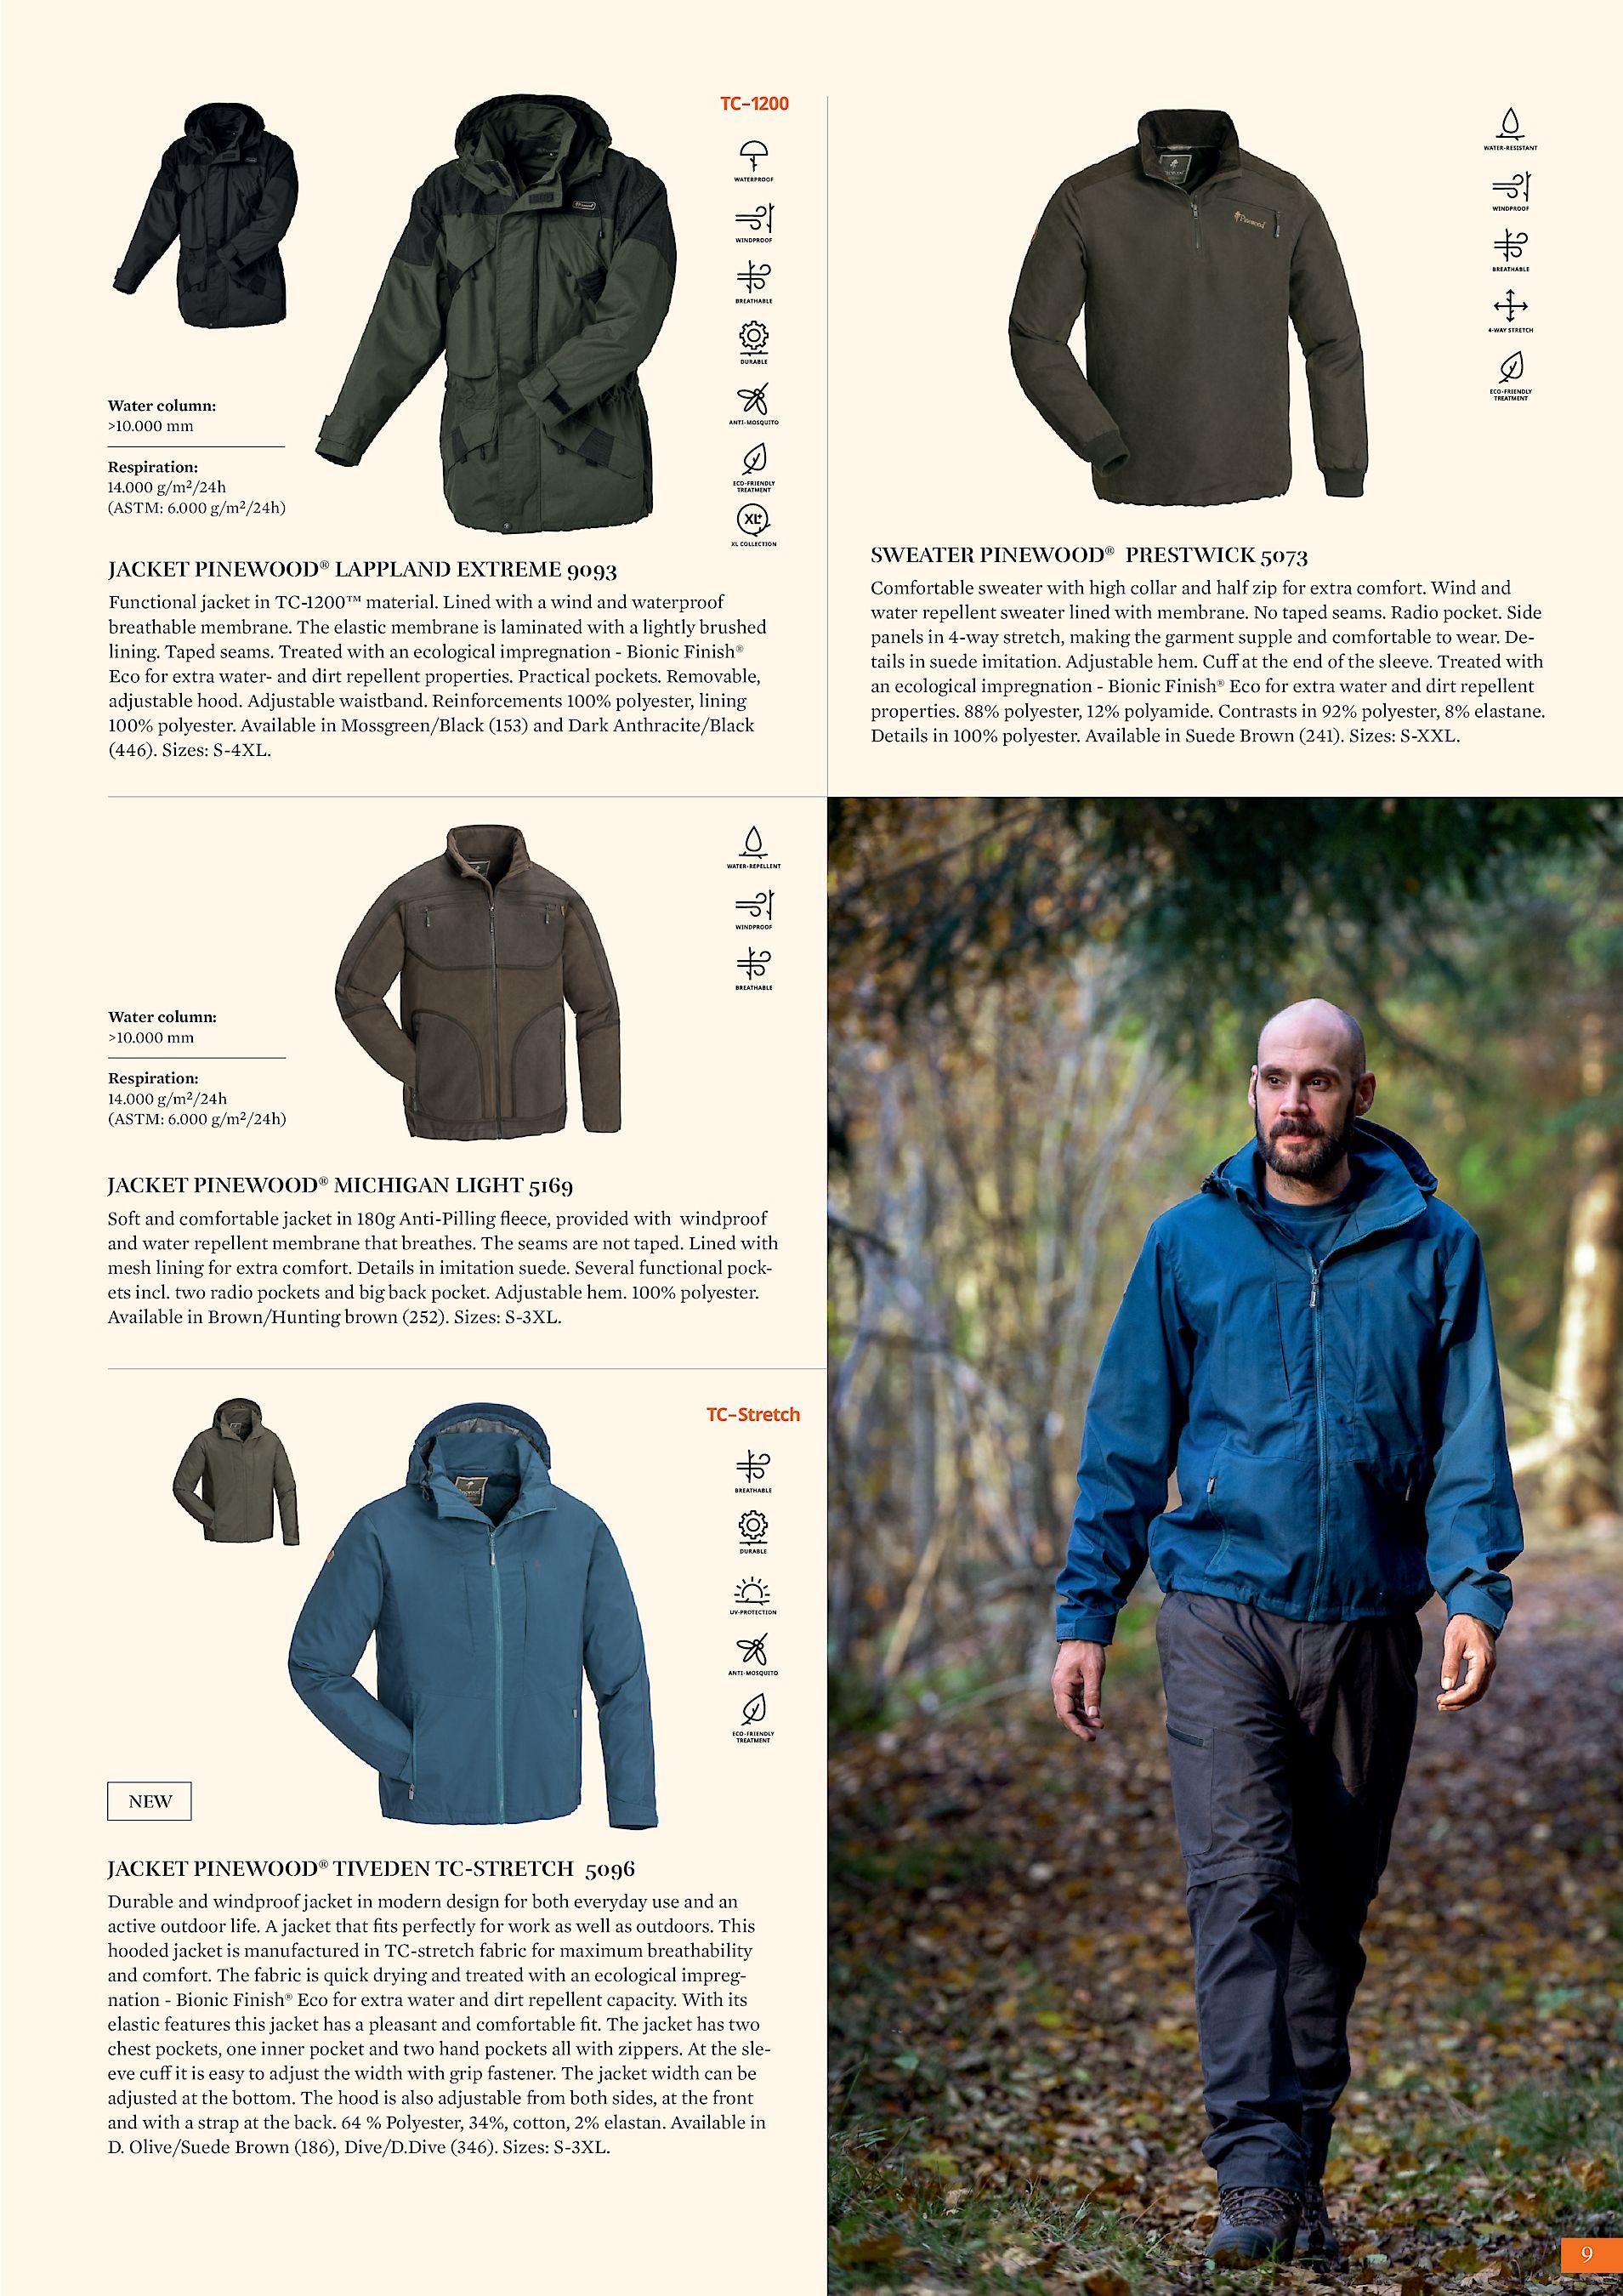 Tireless Man Winter 10% Nylon 90% Polyester Fiber 90 Authentic White Down Jacket High Quality Goods Jackets & Coats Men's Clothing